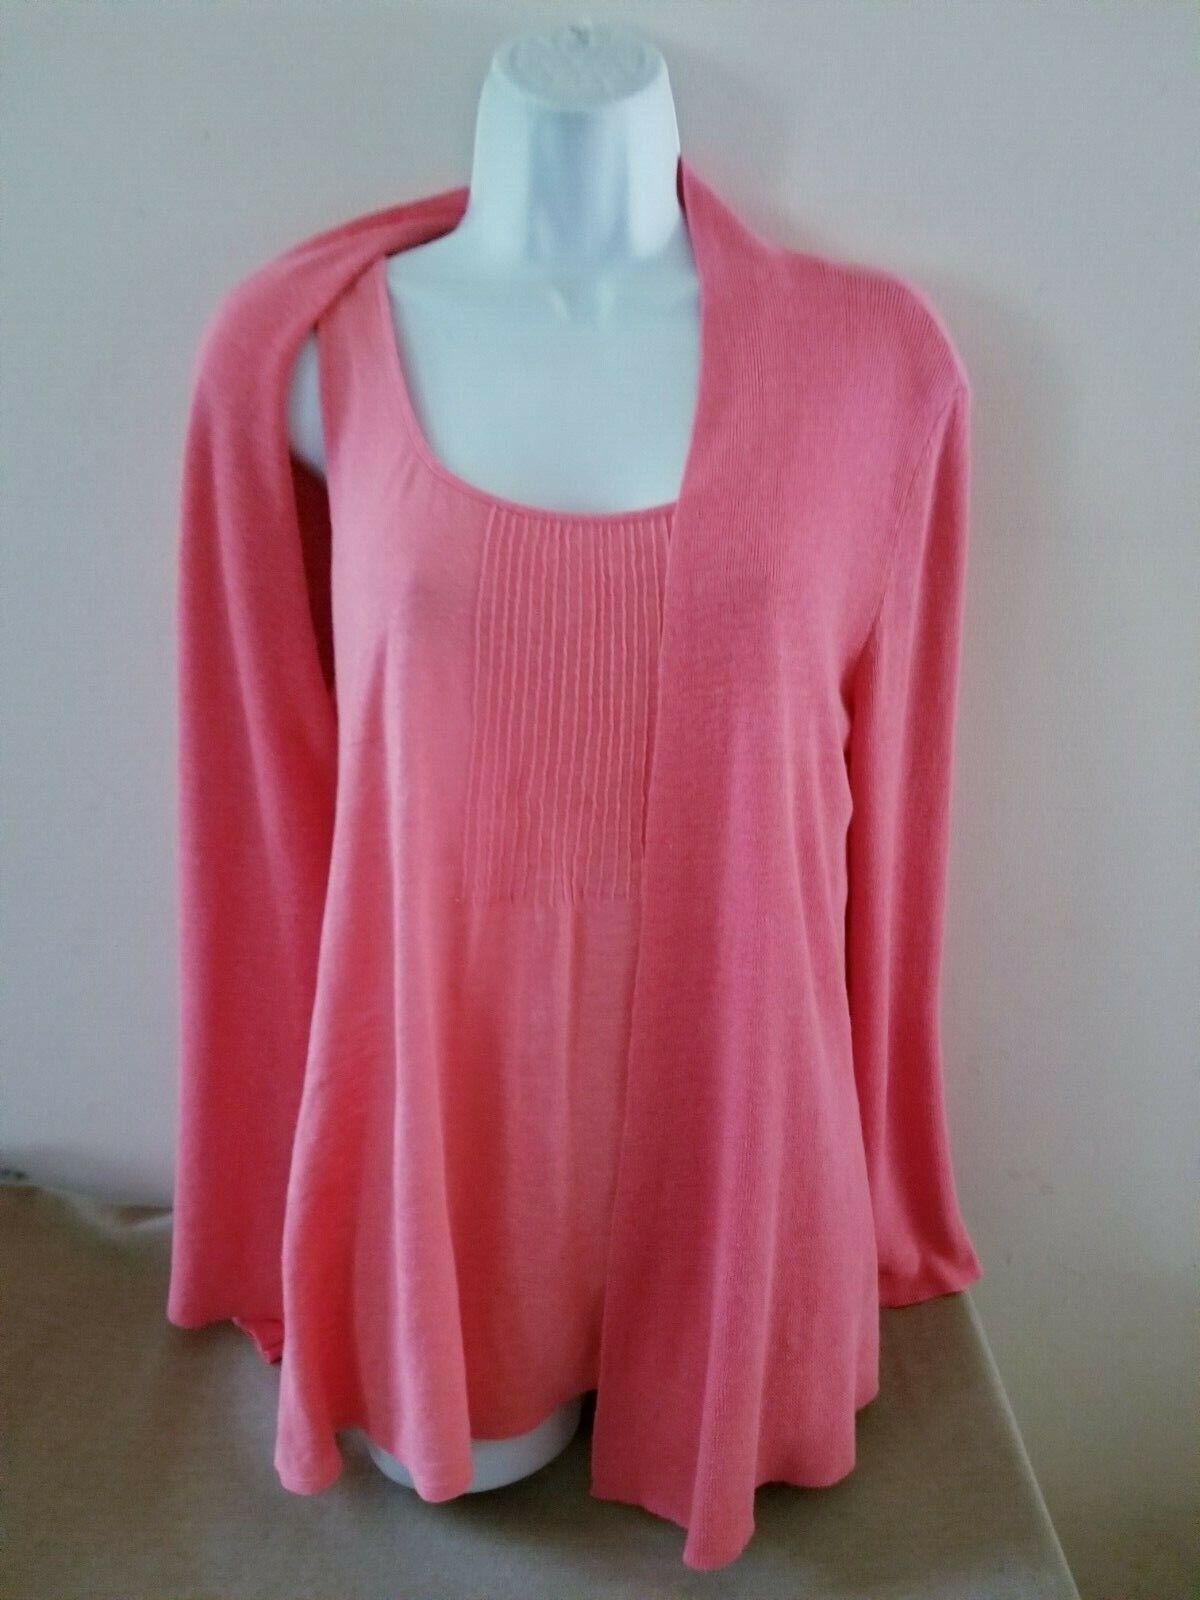 Eileen Fisher Twinset L S Öffnen Flow Cardigan + Shell Sweater Set in Coral Sz M L